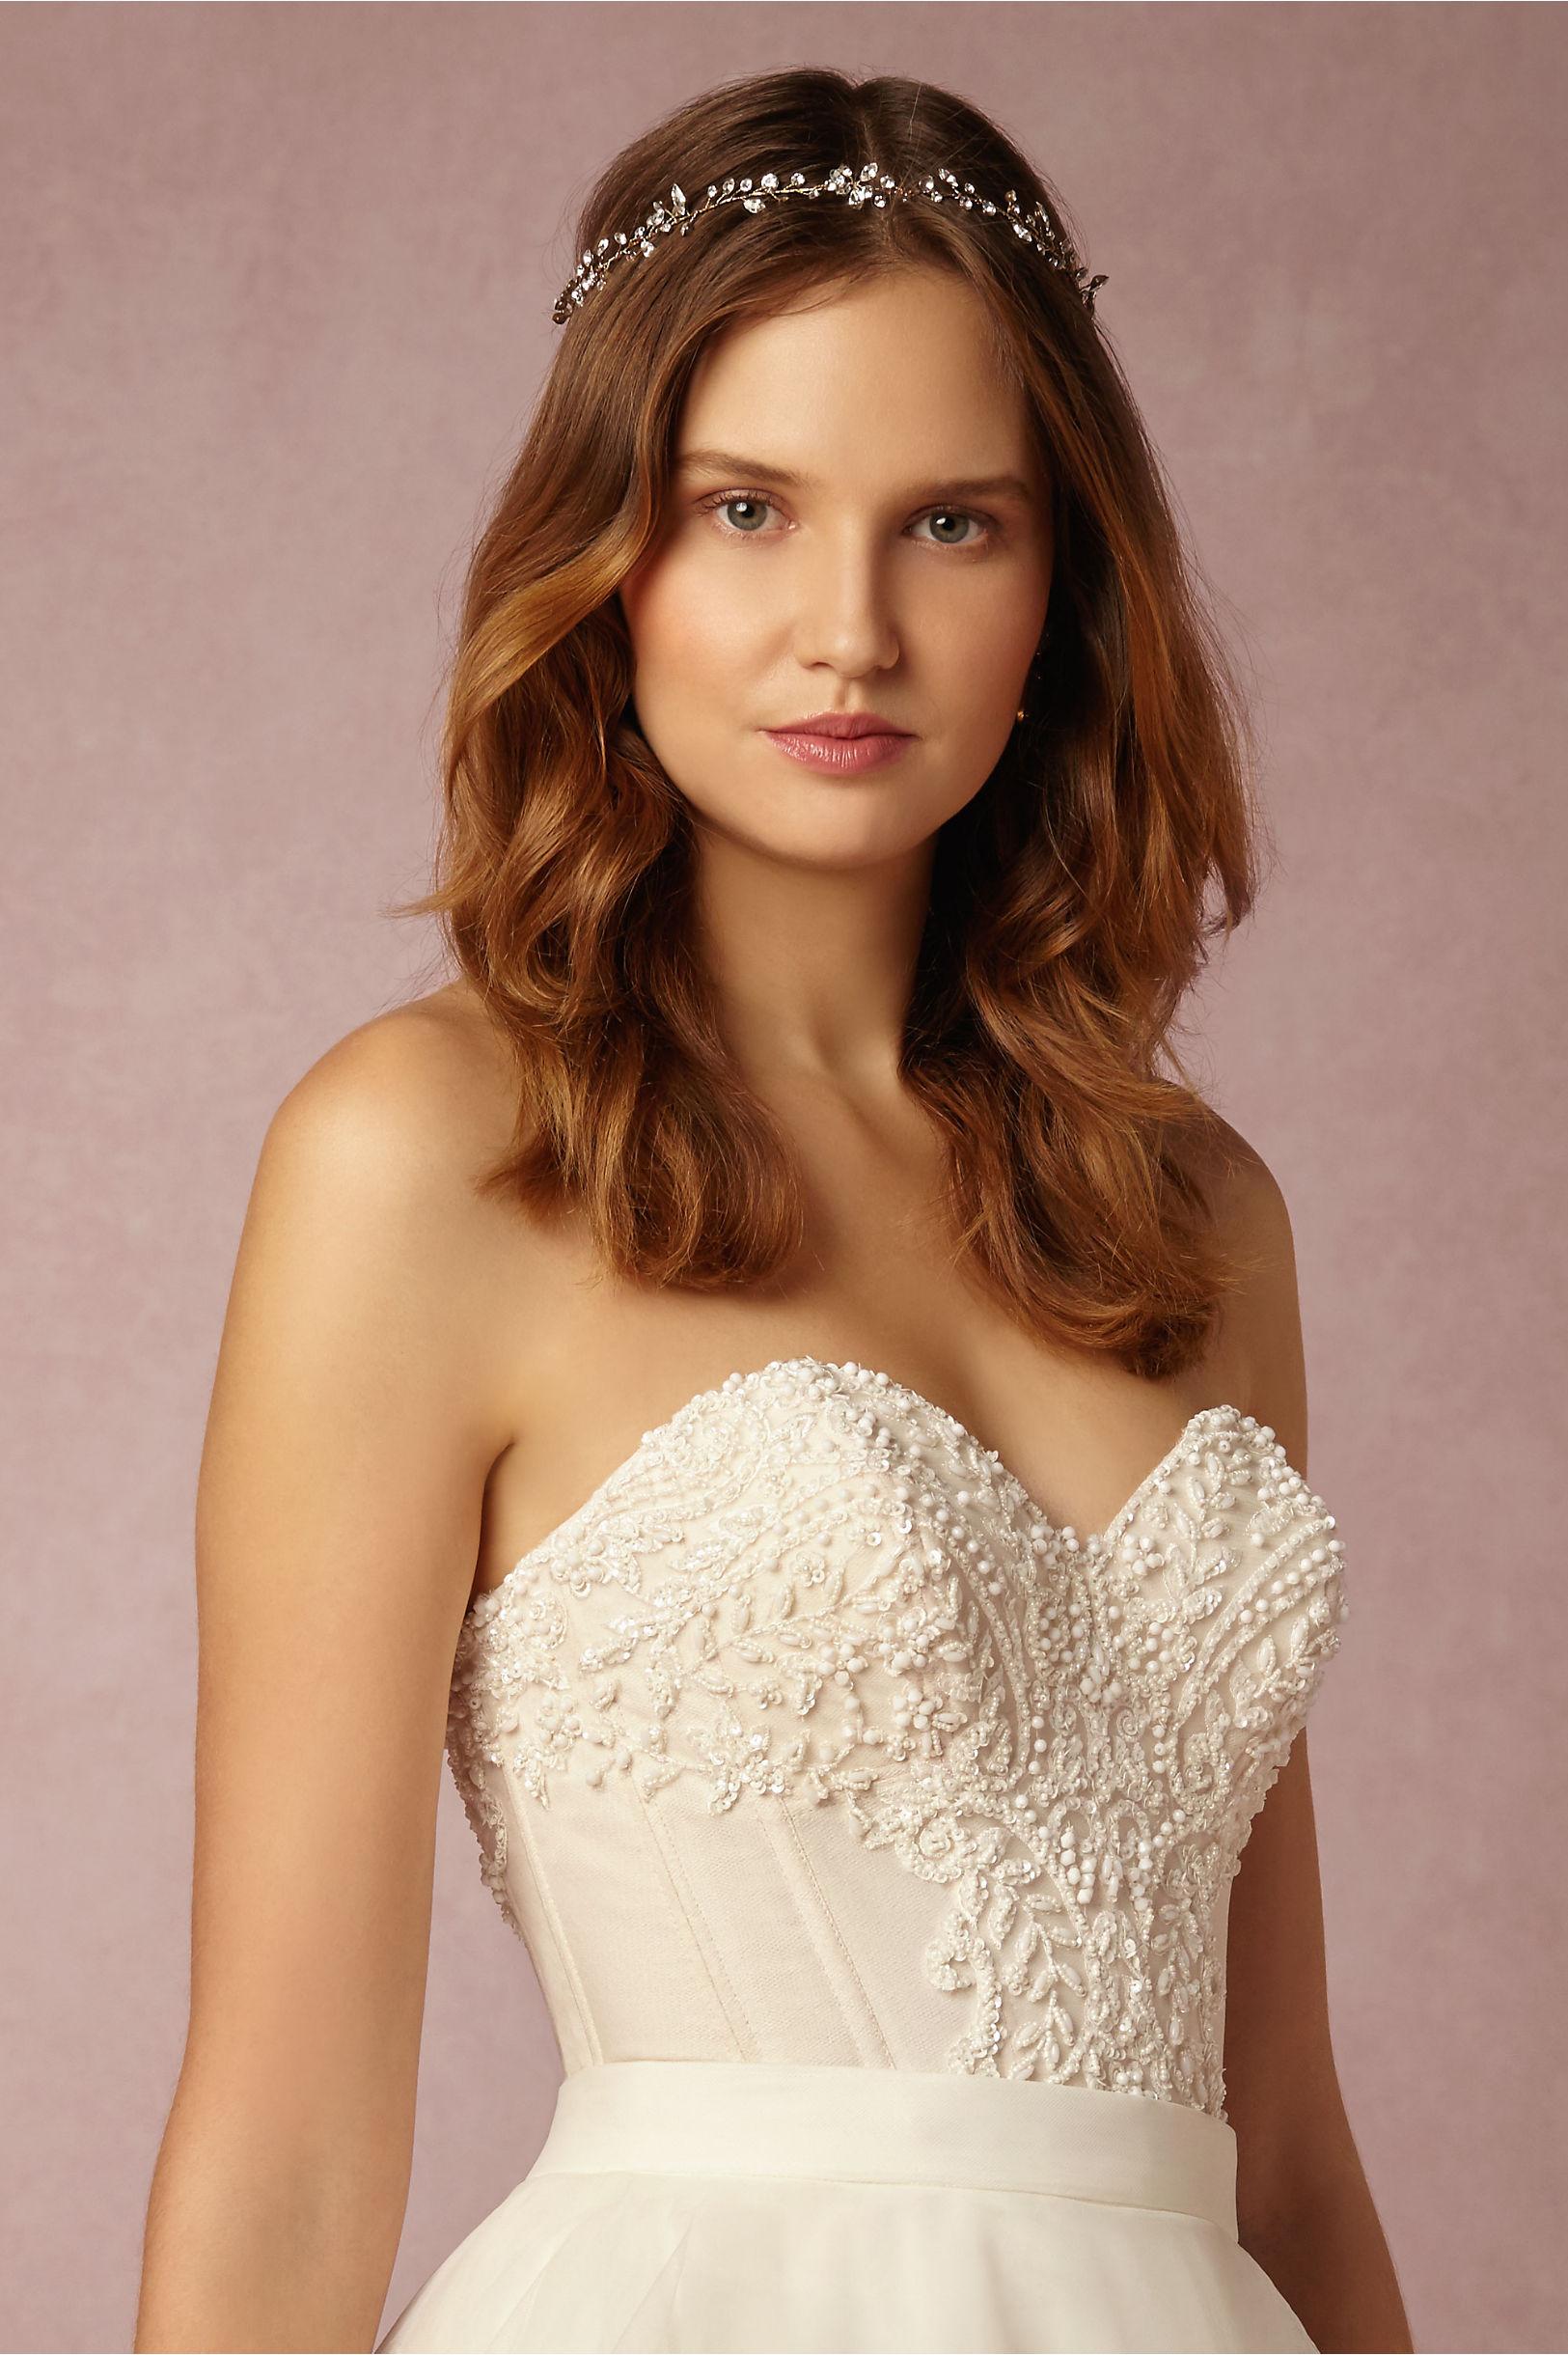 Pink Corset Wedding Dresses